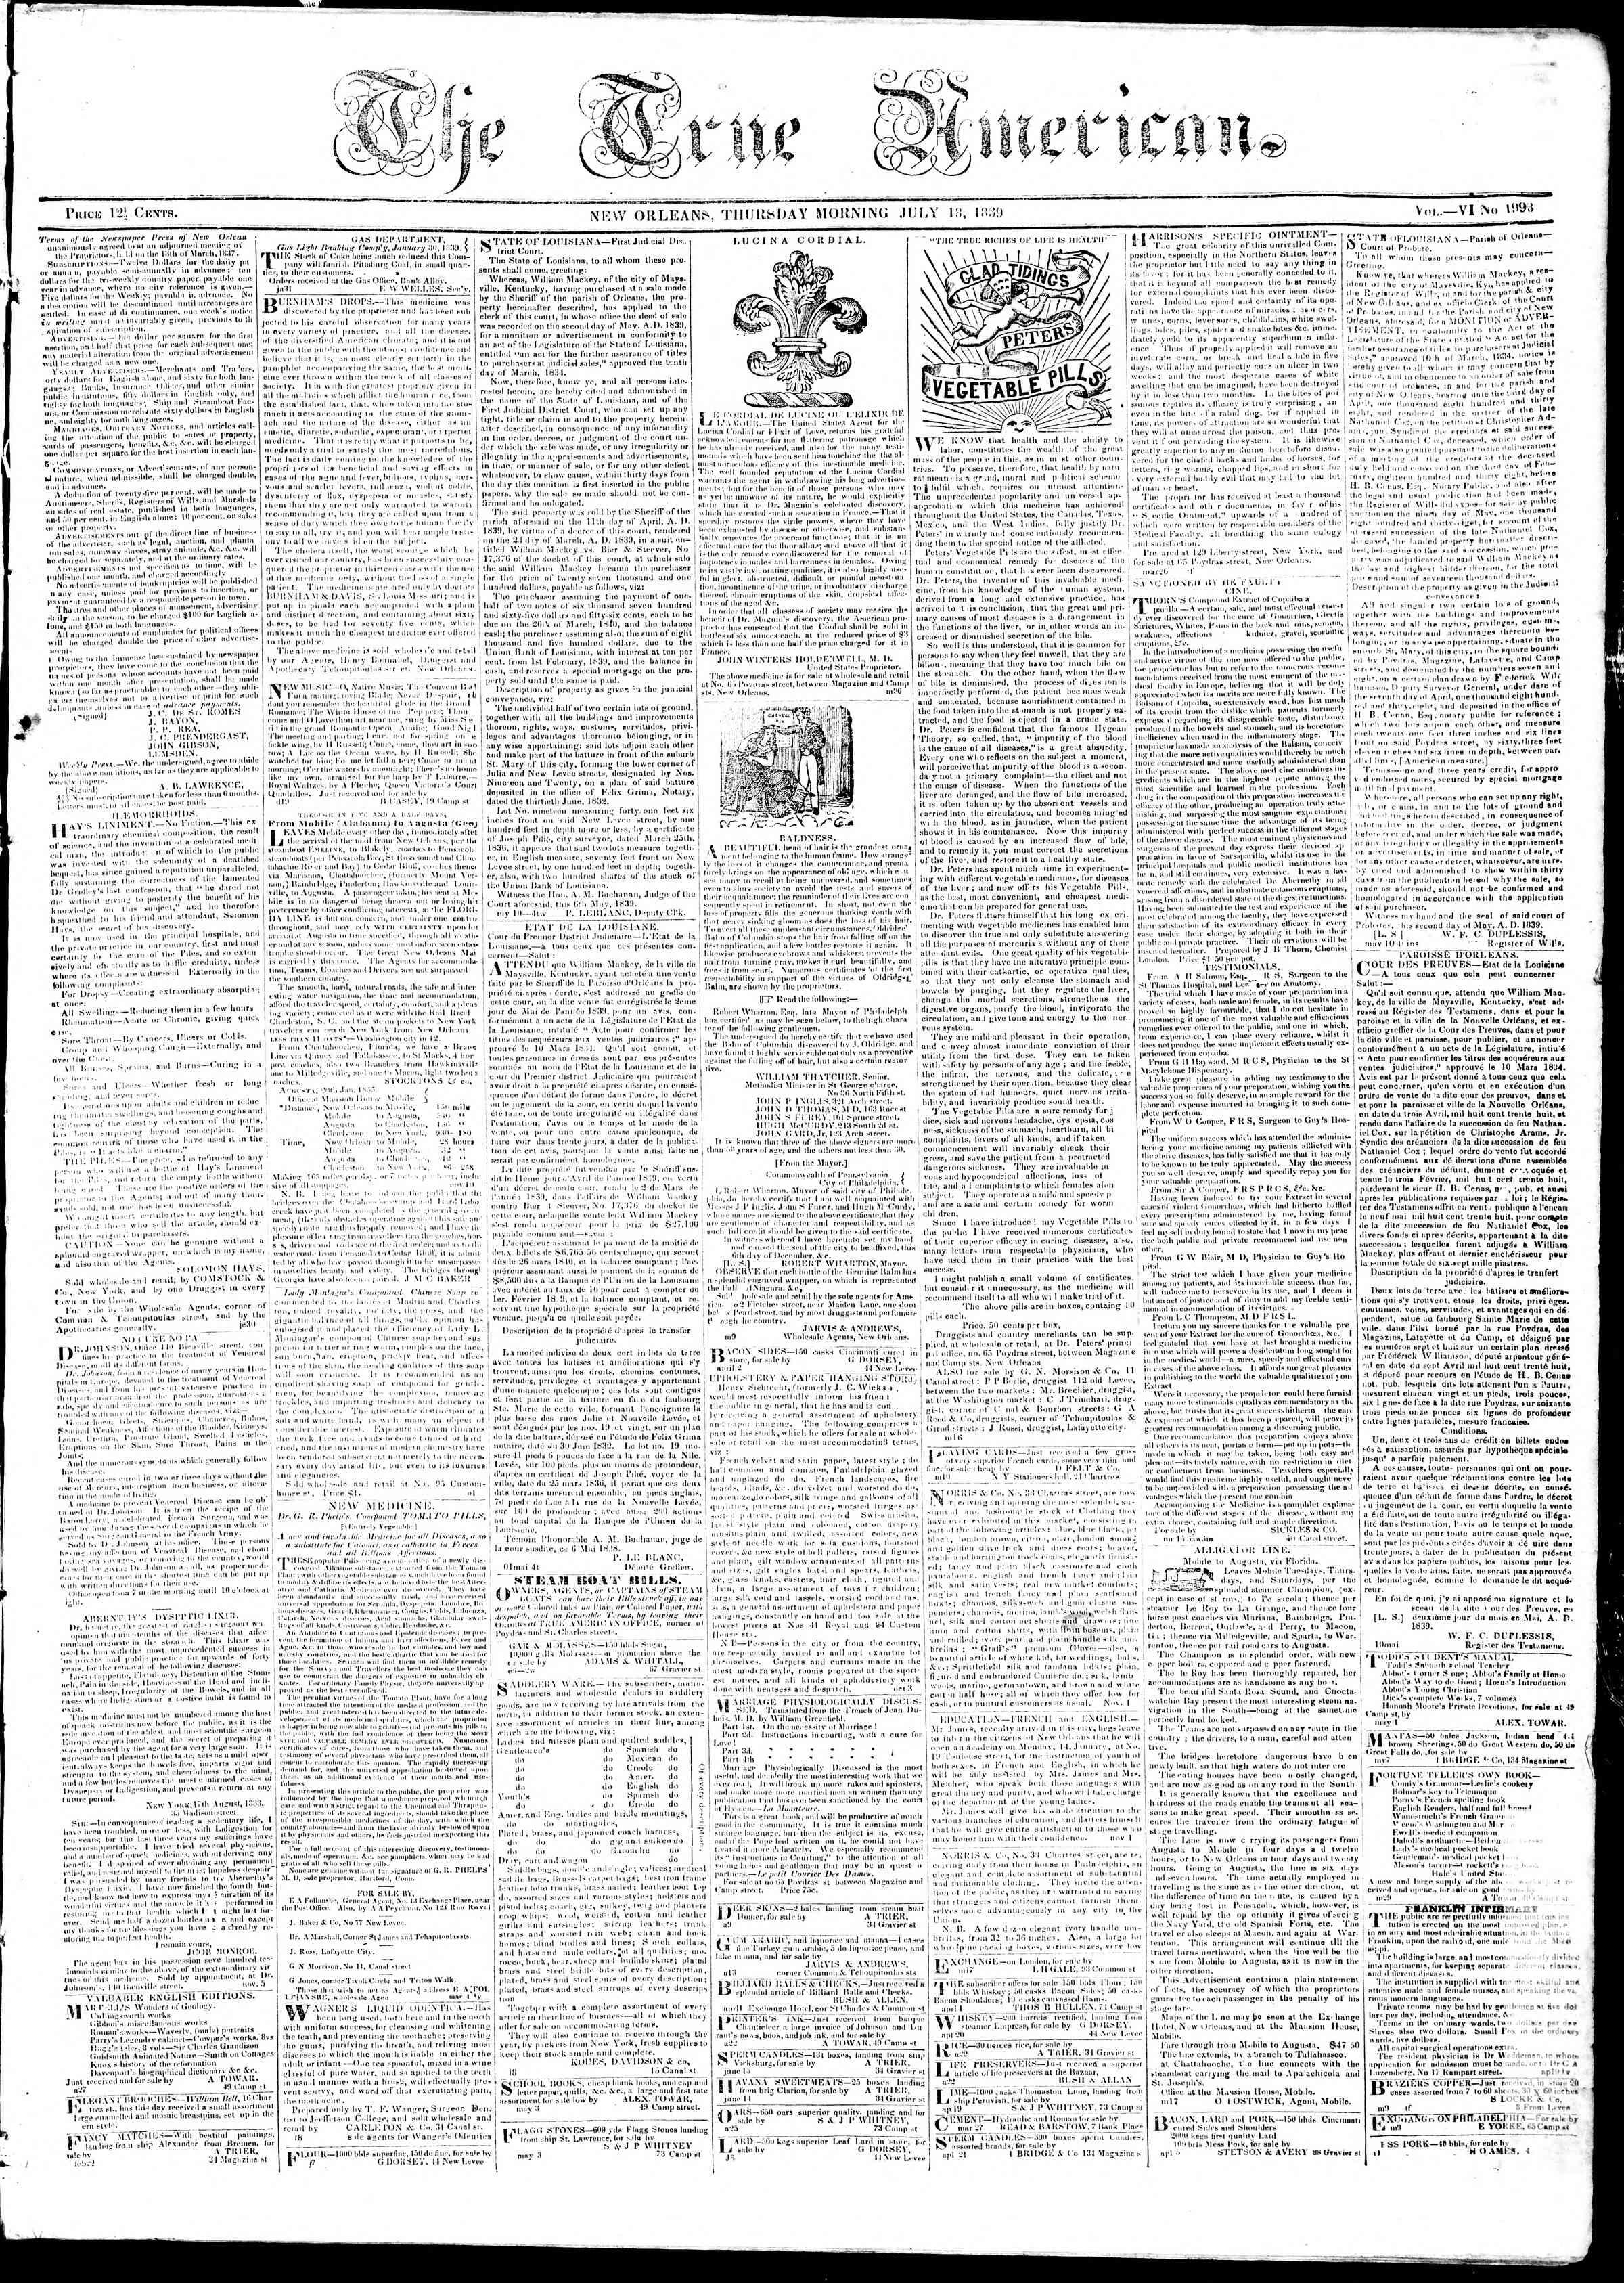 July 18, 1839 Tarihli True American Gazetesi Sayfa 1